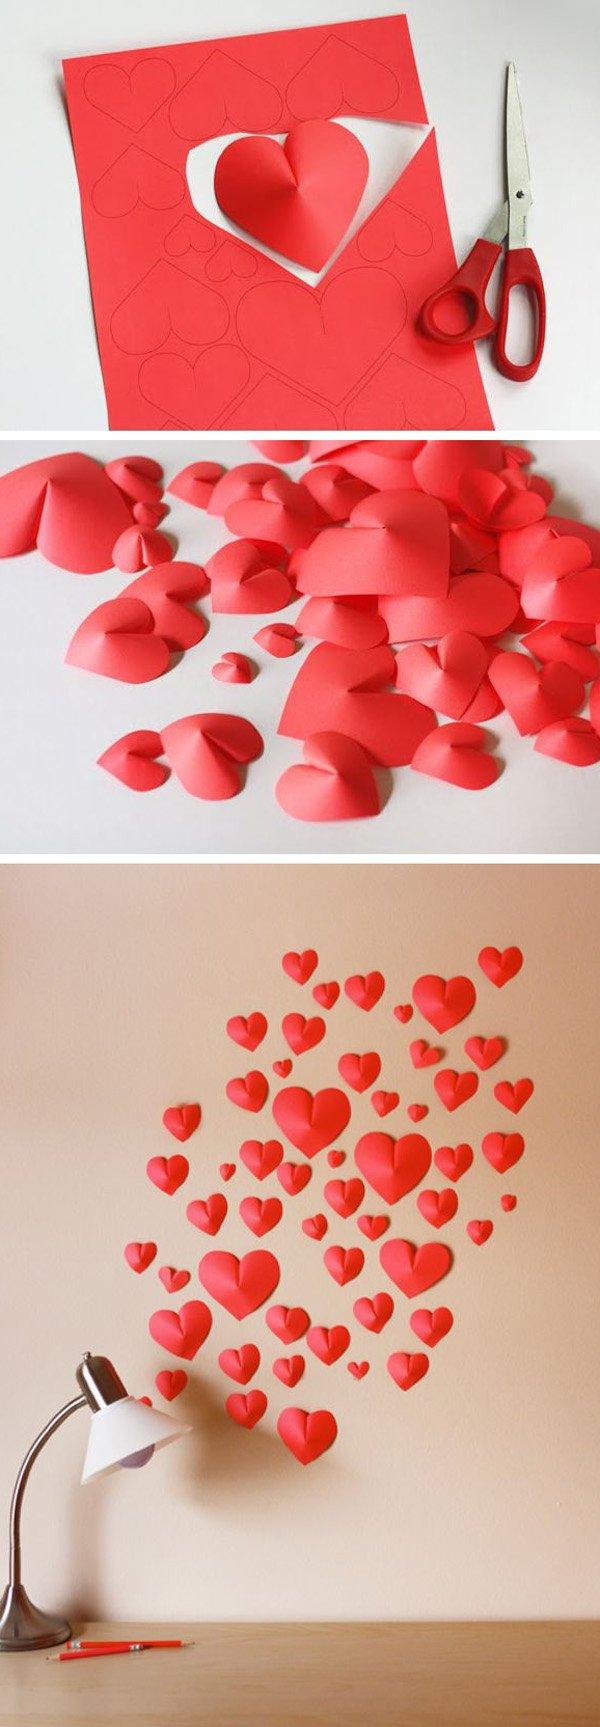 Decoratiuni minunate de Valentine's Day, facute manual - Poza 20